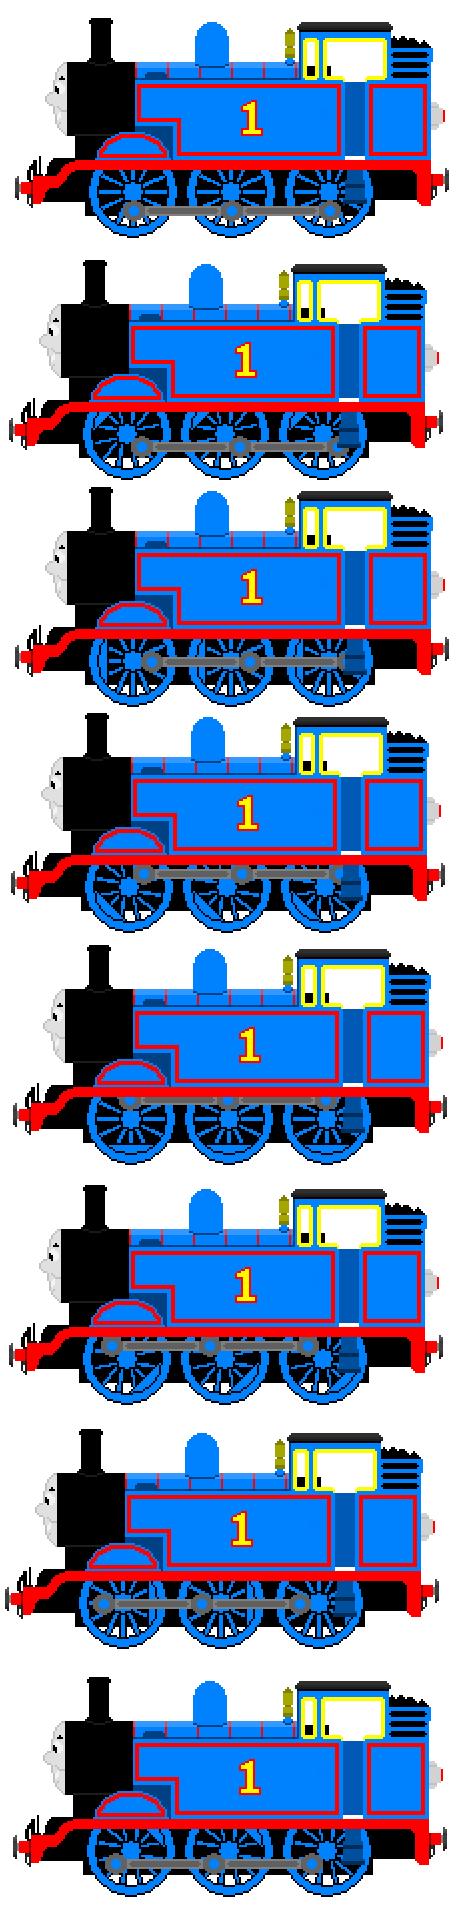 Thomas the train full size sheets -  Thomas The Tank Engine Full Sprite Sheet By Jamesfan1991